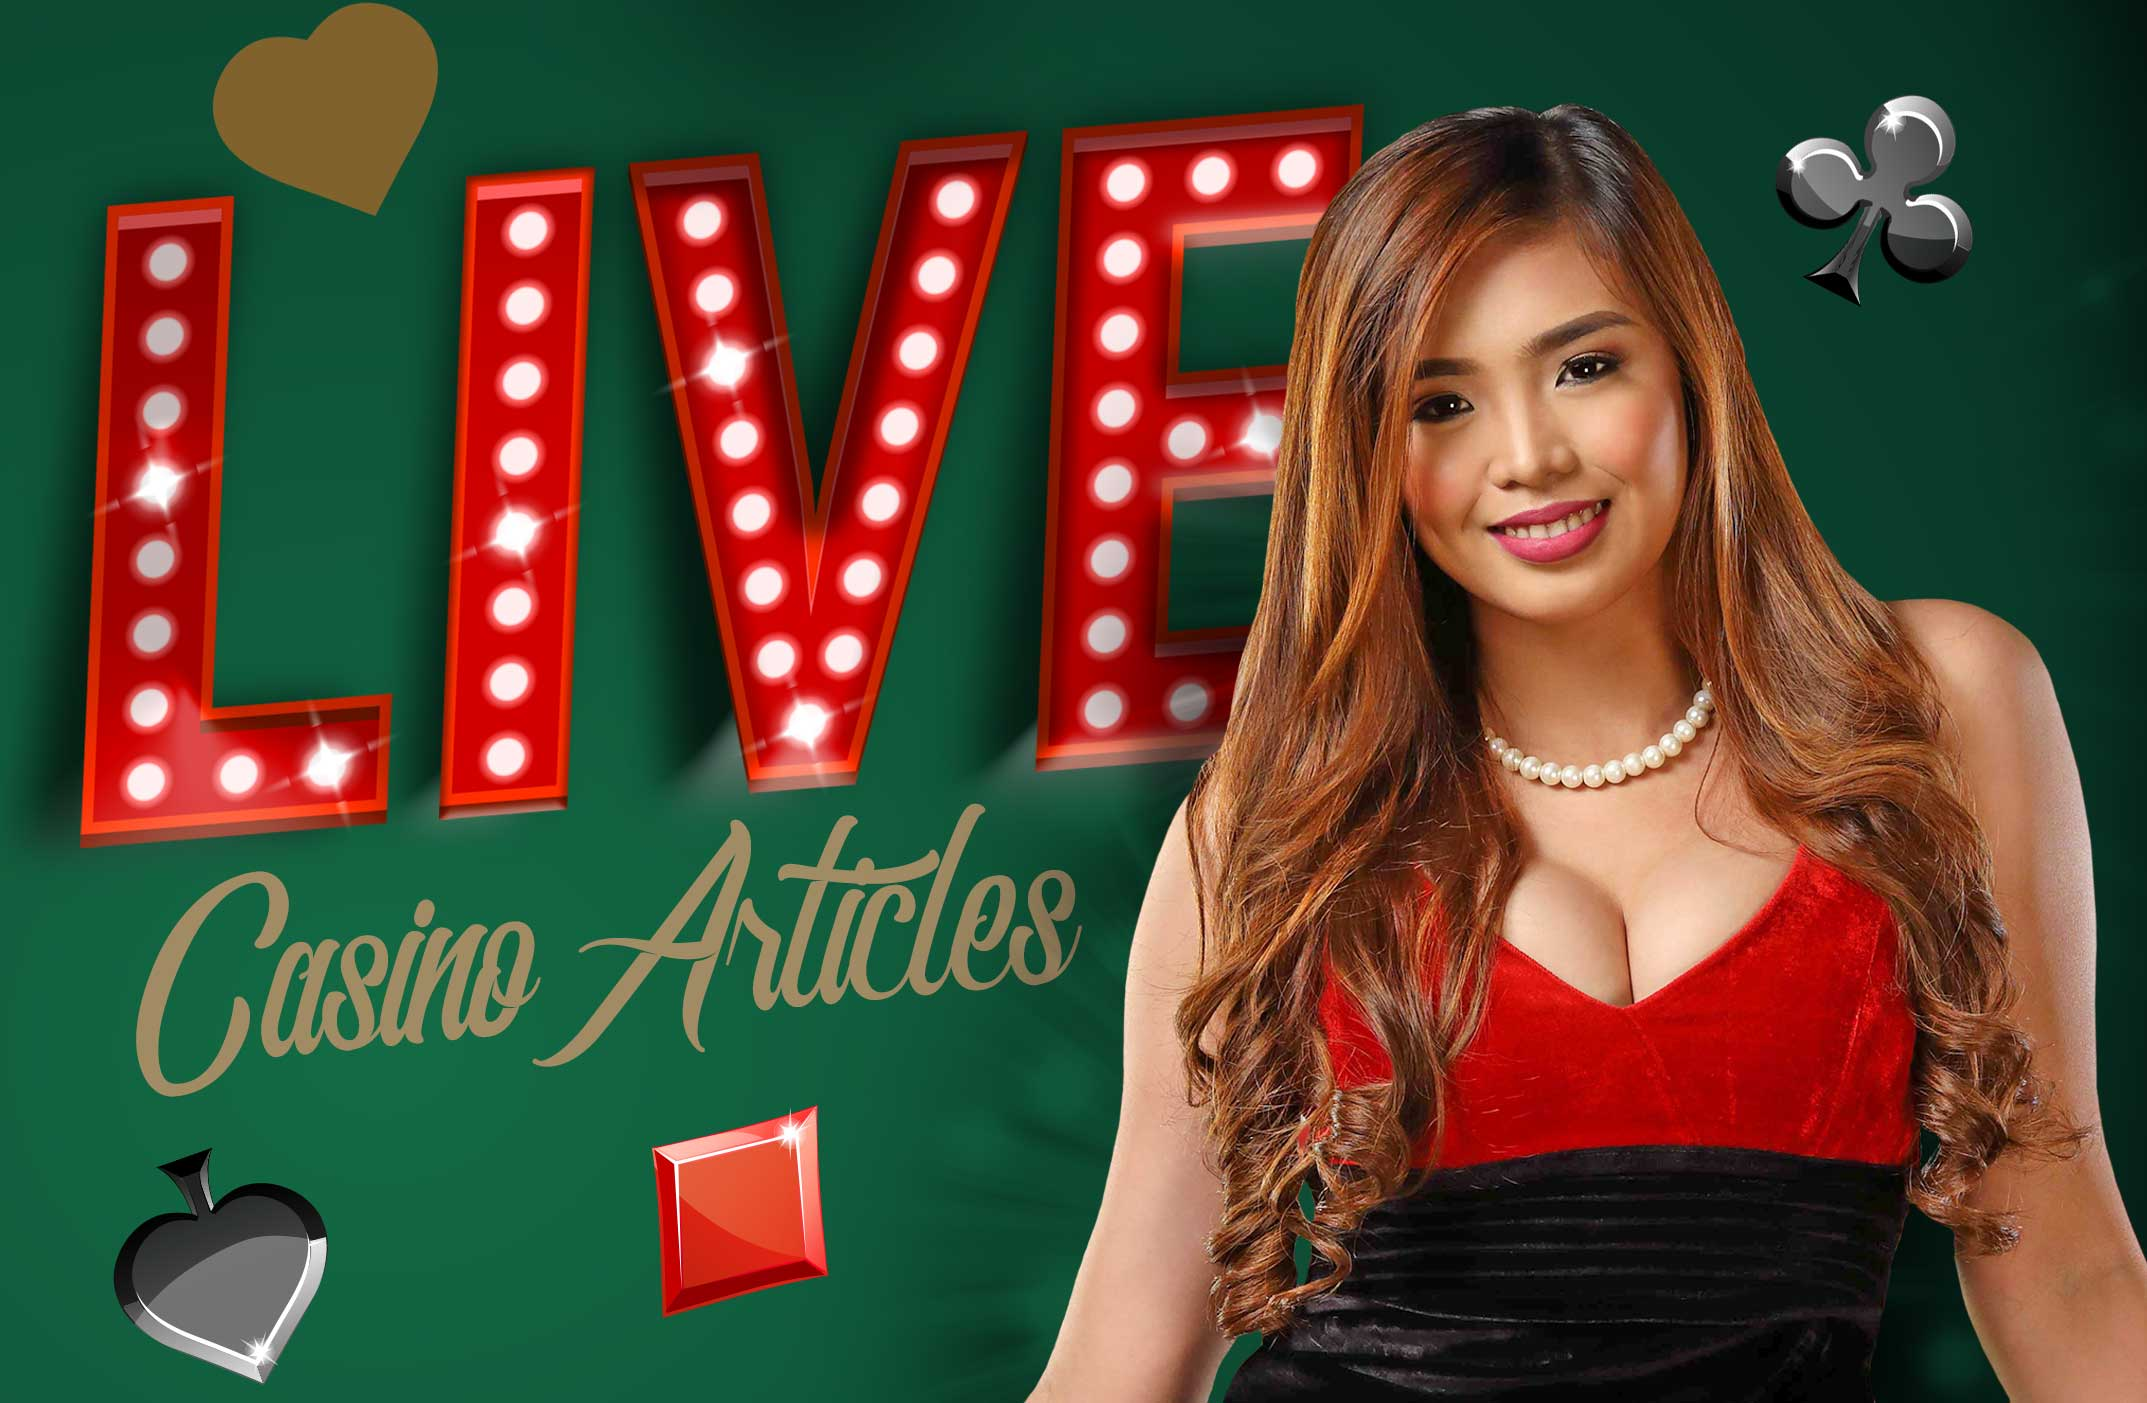 Live Casino Articles - Roulette, Blackjack, Dream Catcher, Baccarat